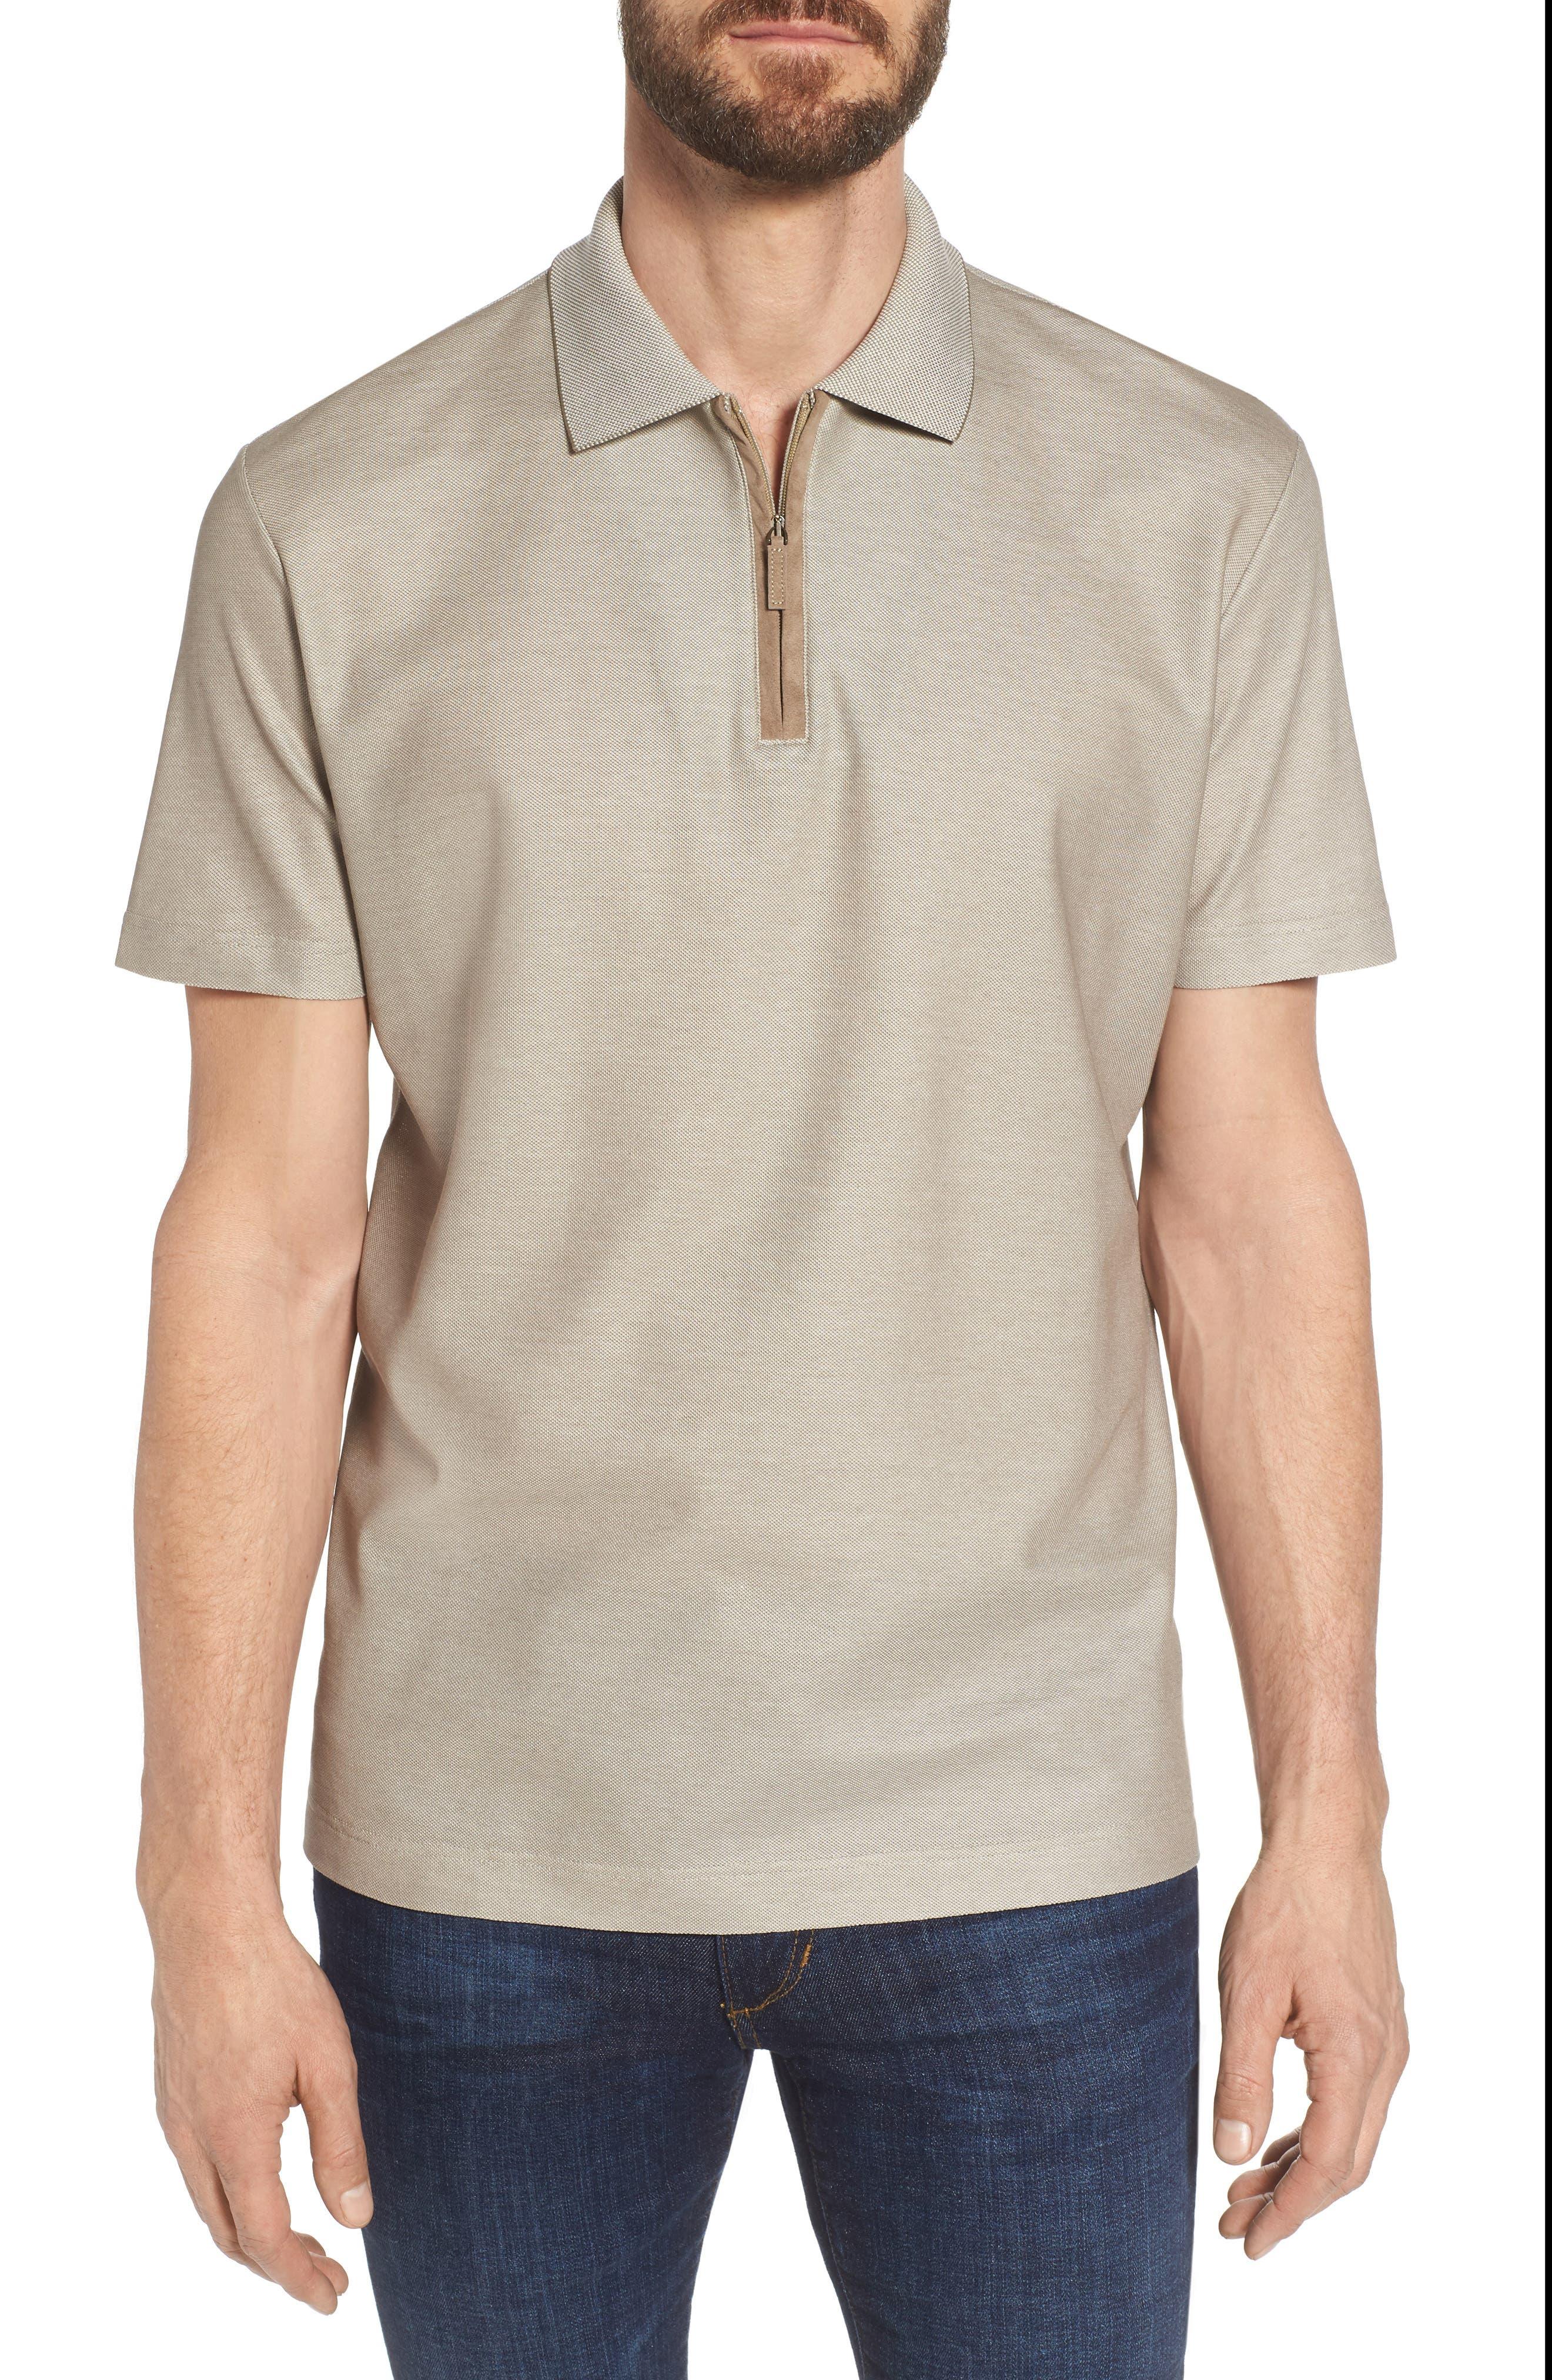 Cotton Polo Shirt,                             Main thumbnail 1, color,                             Tan